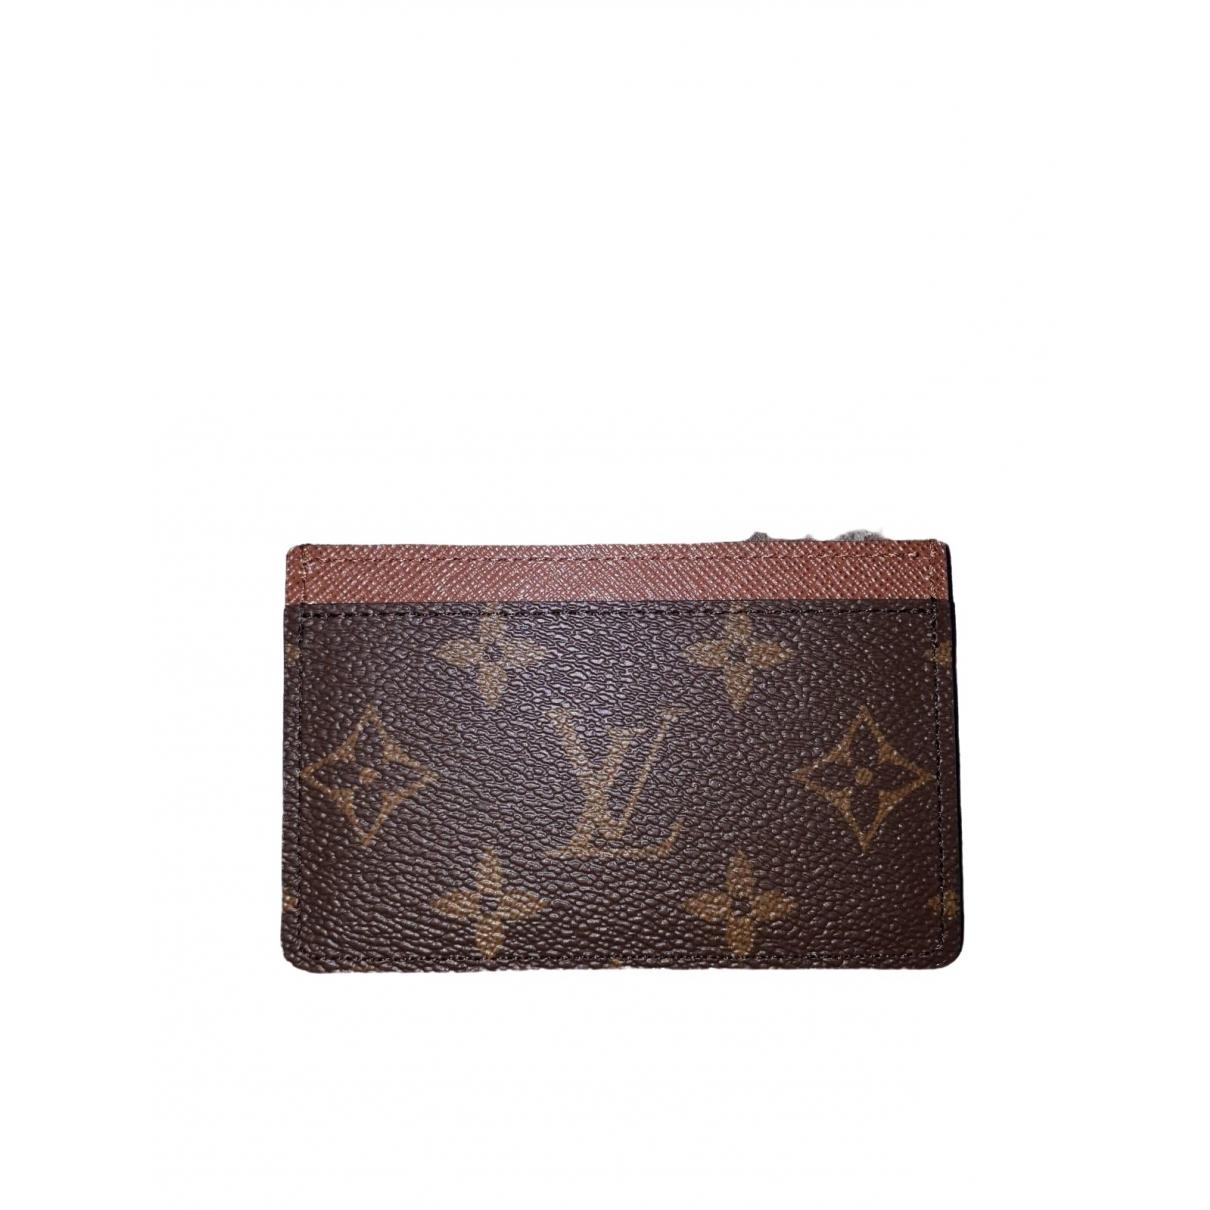 Tarjetero de Lona Louis Vuitton